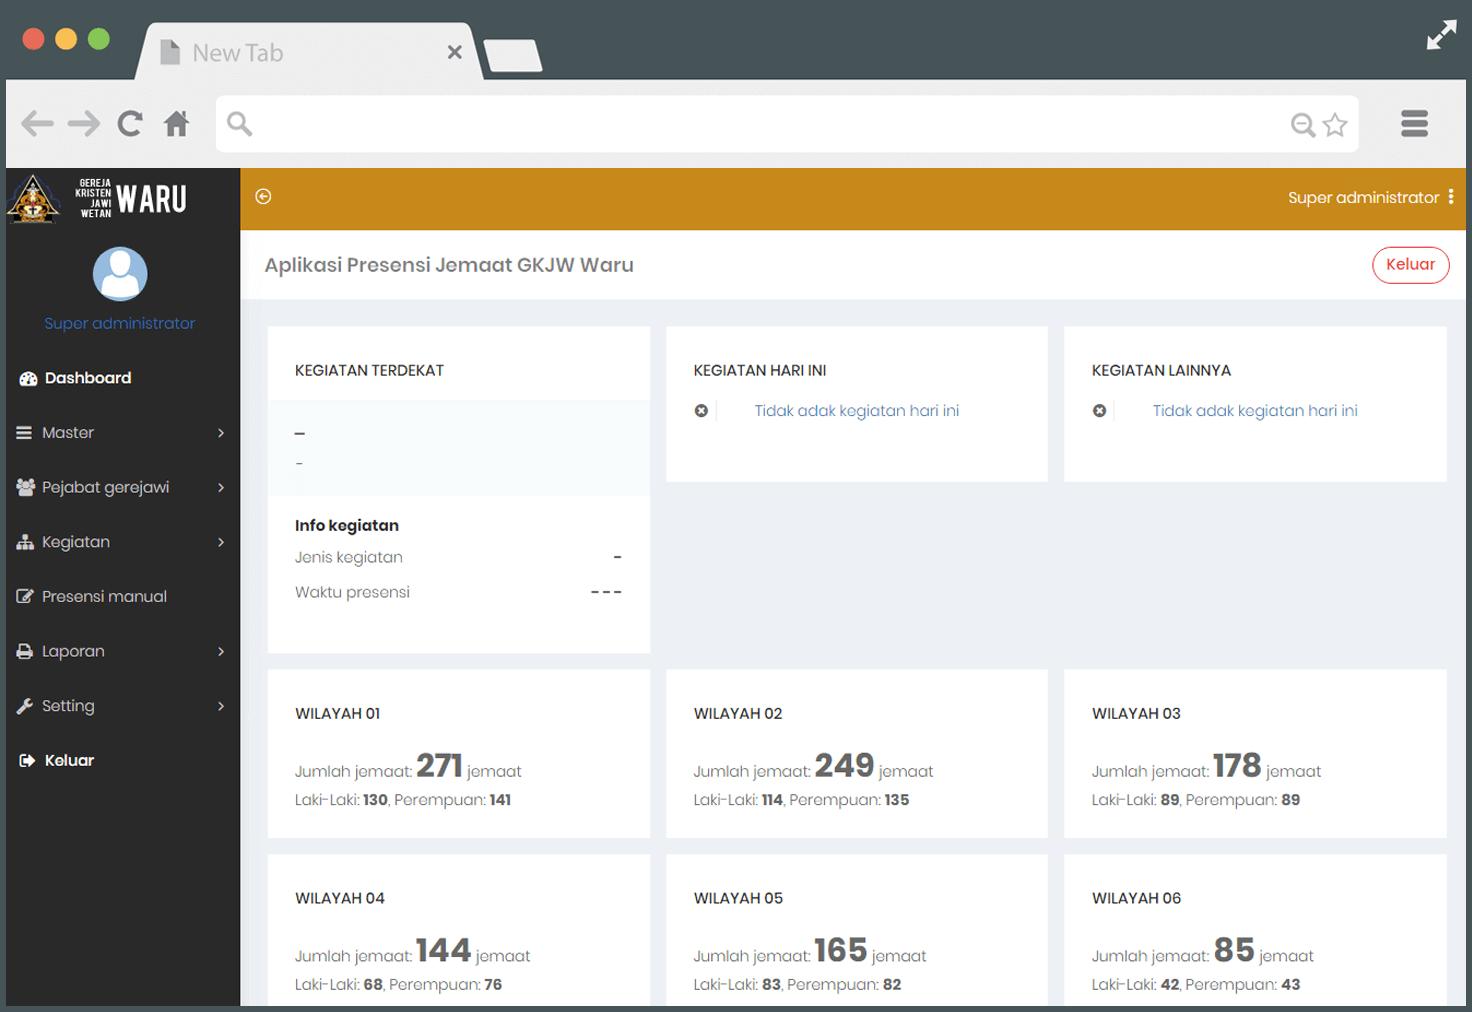 Dashboard - Church Attendance Application System